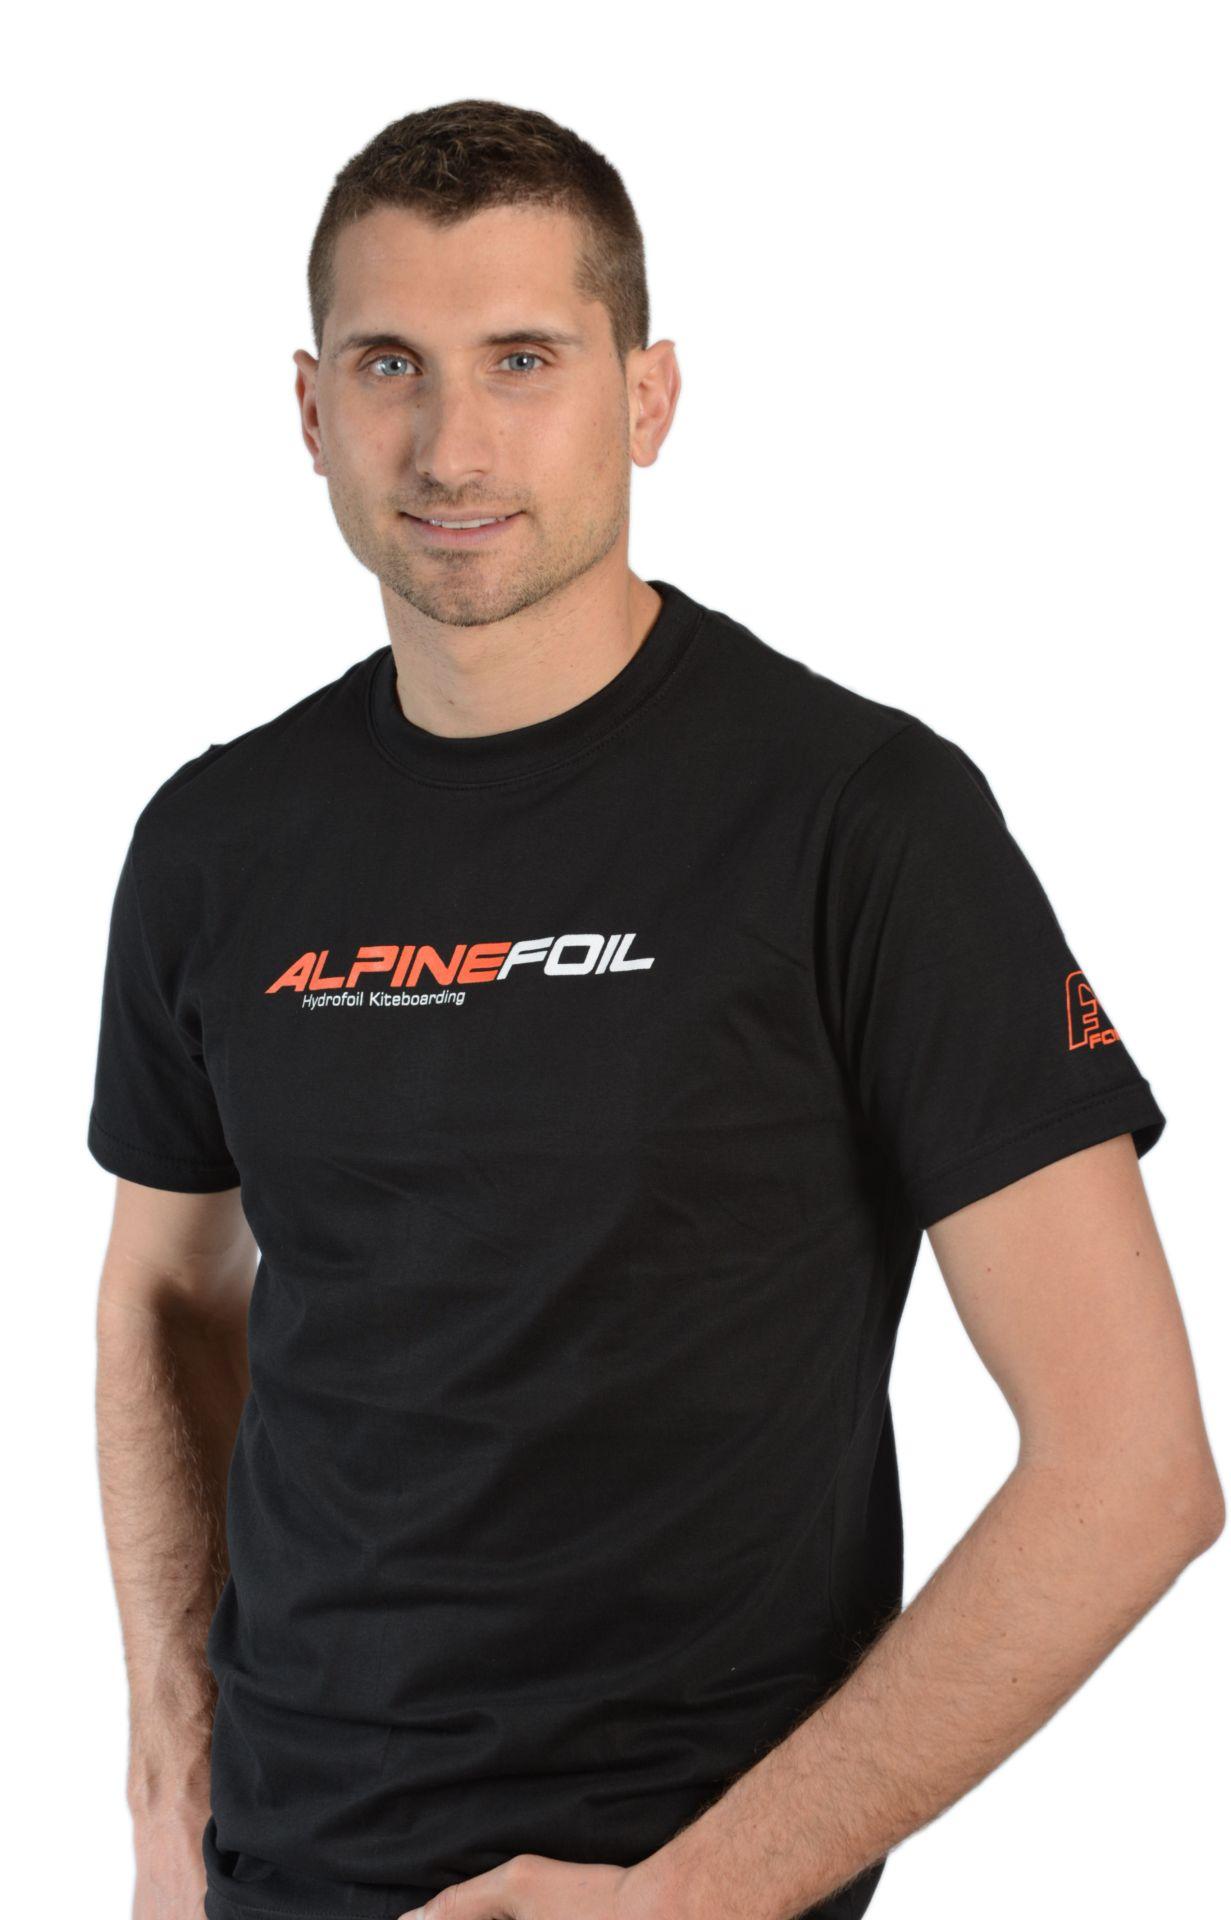 Teeshirt alpinefoil 1